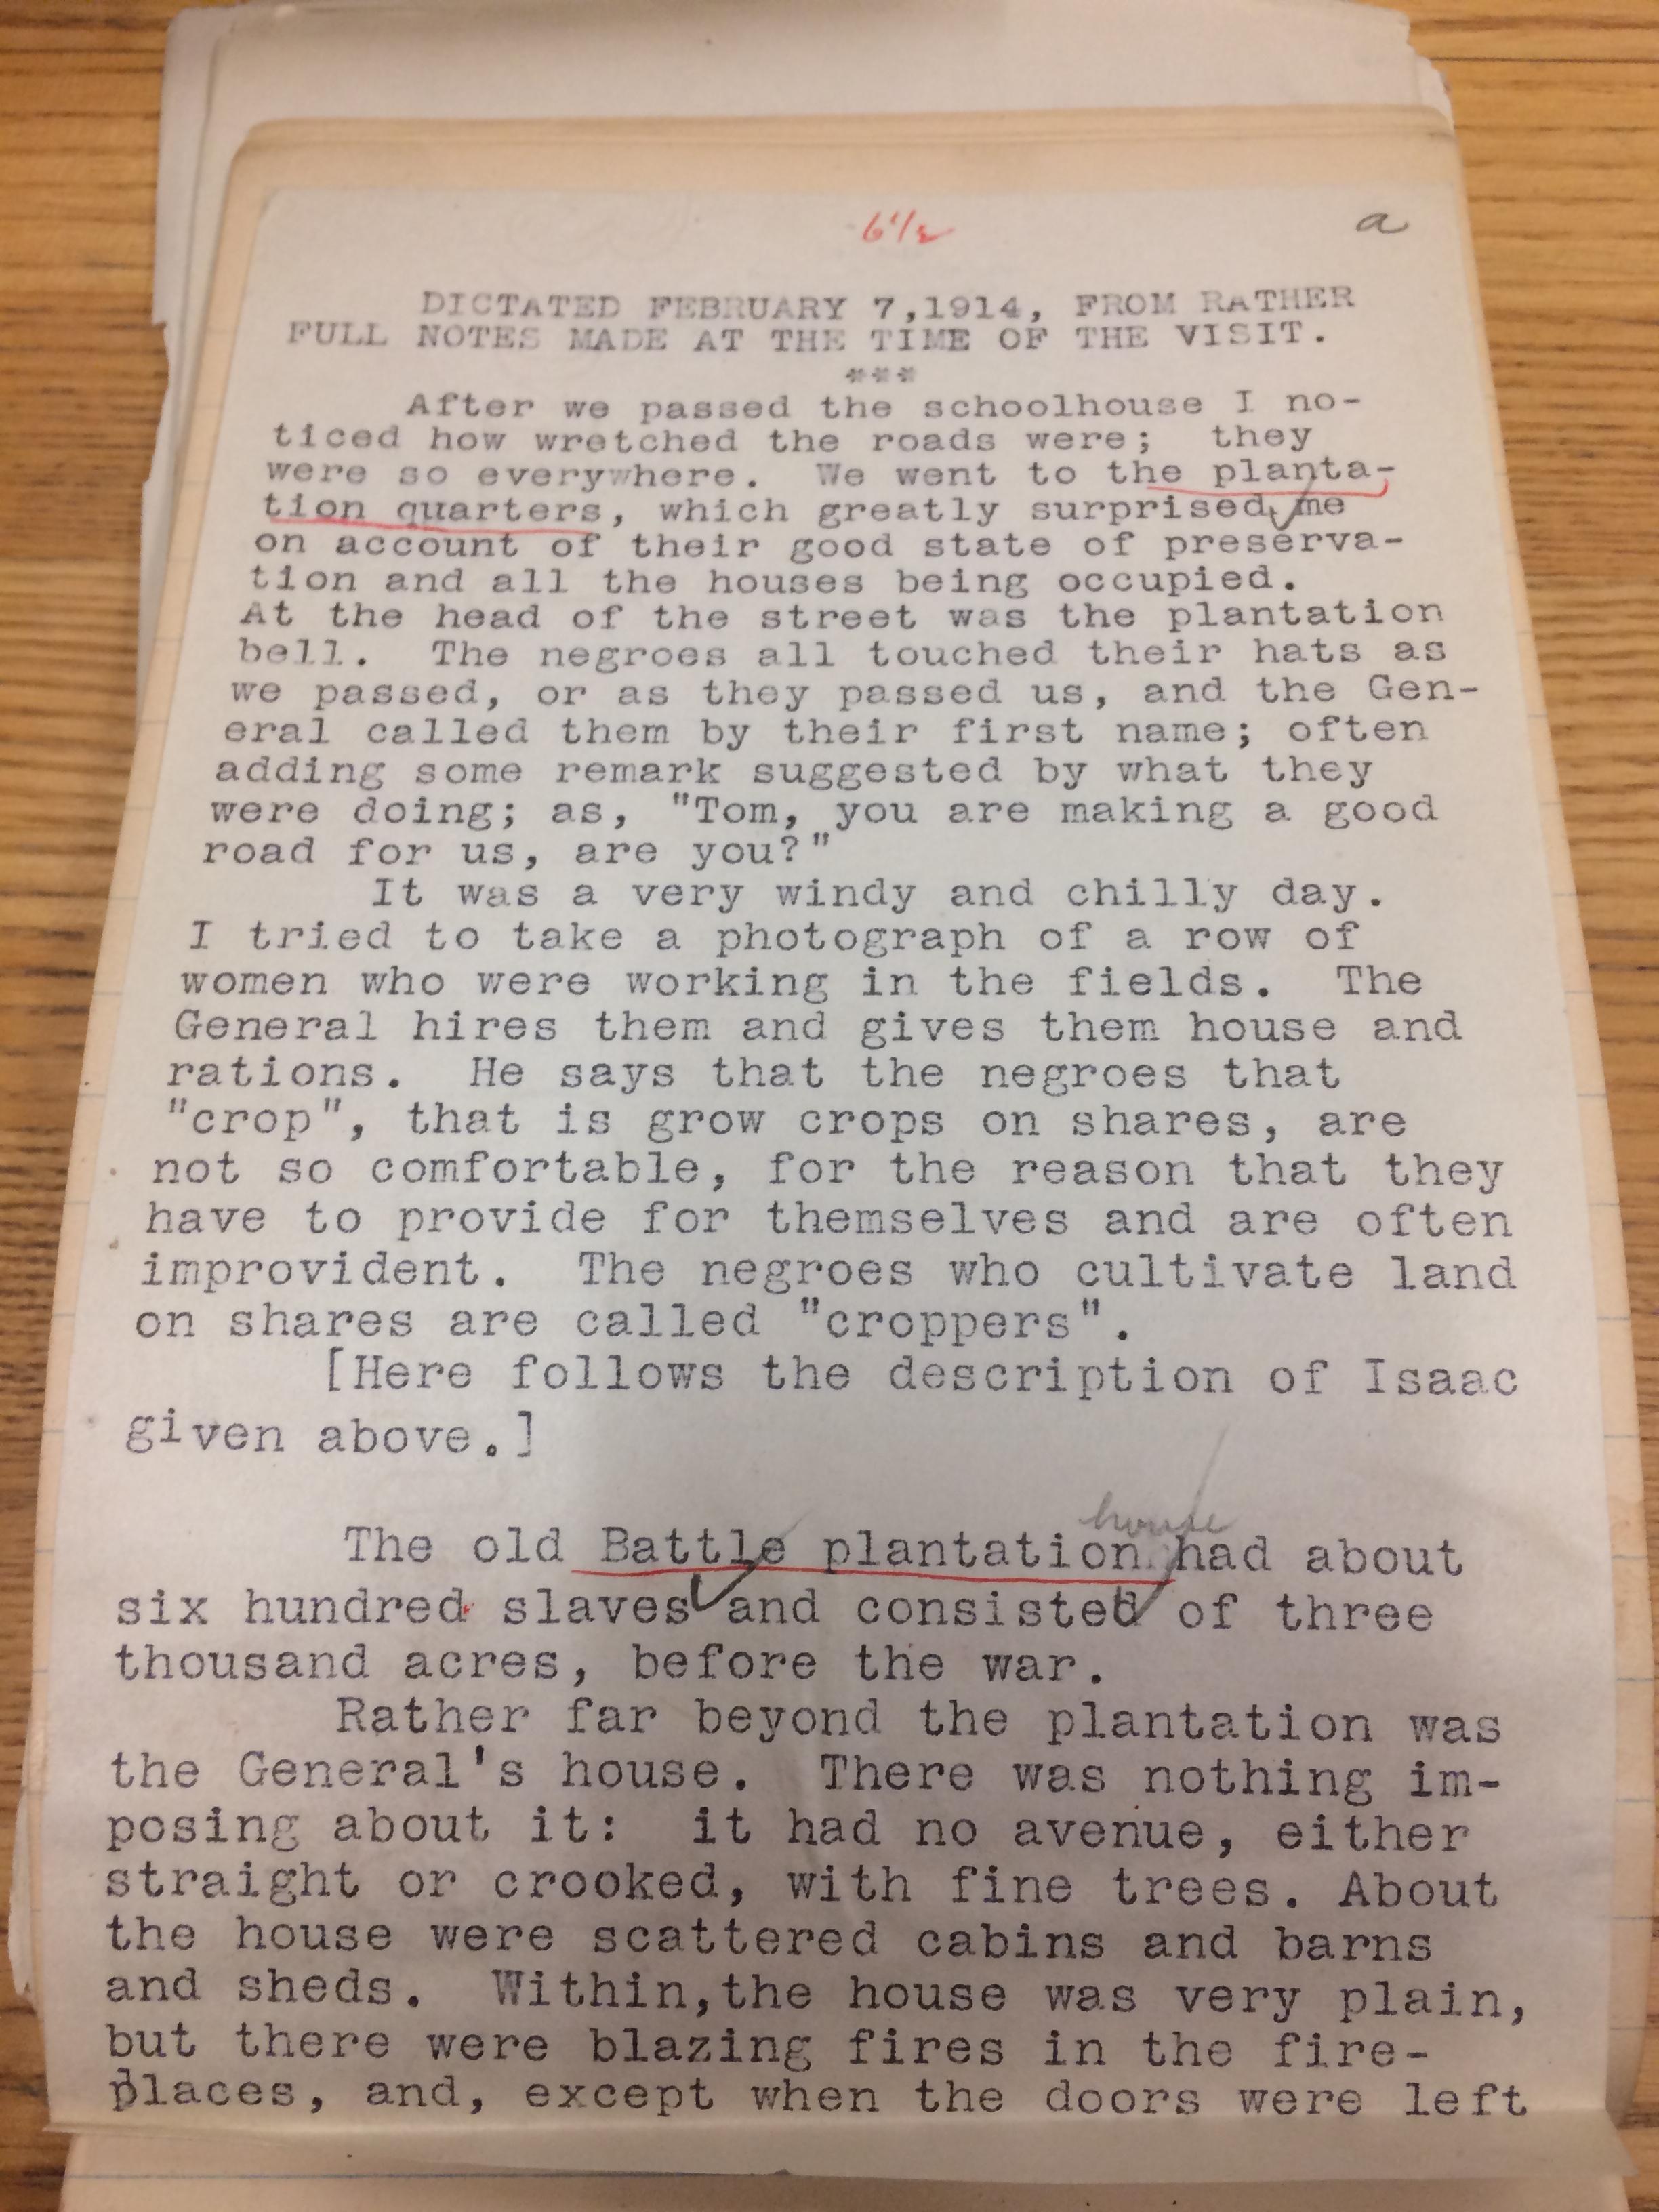 Bancroft entry about plantation